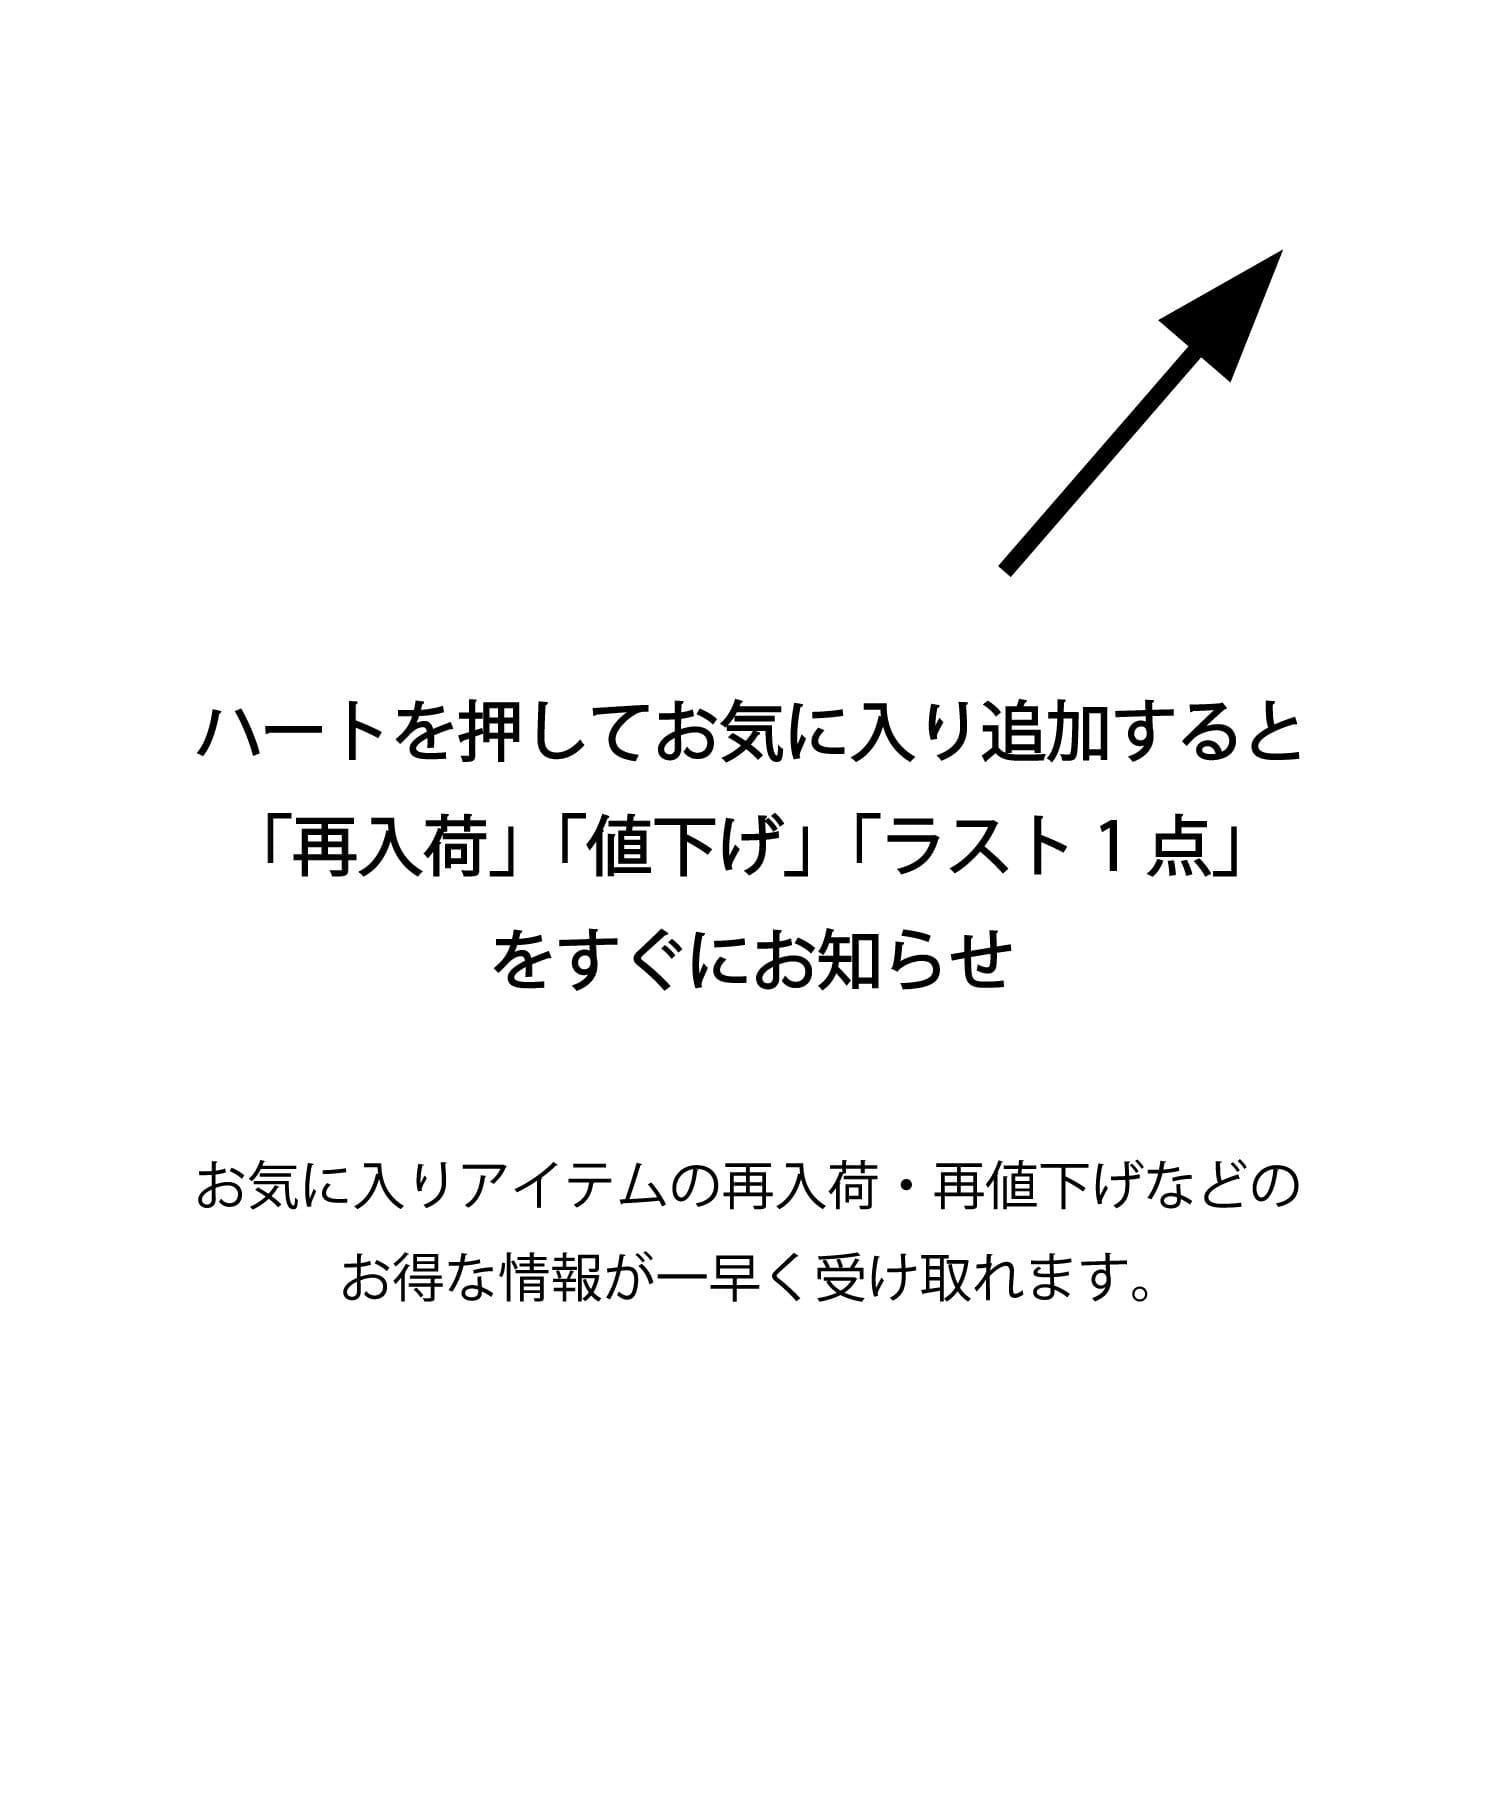 un dix cors(アンディコール) 【大人のカジュアルセットアップ】ロゴプリントカットソーセットアップ